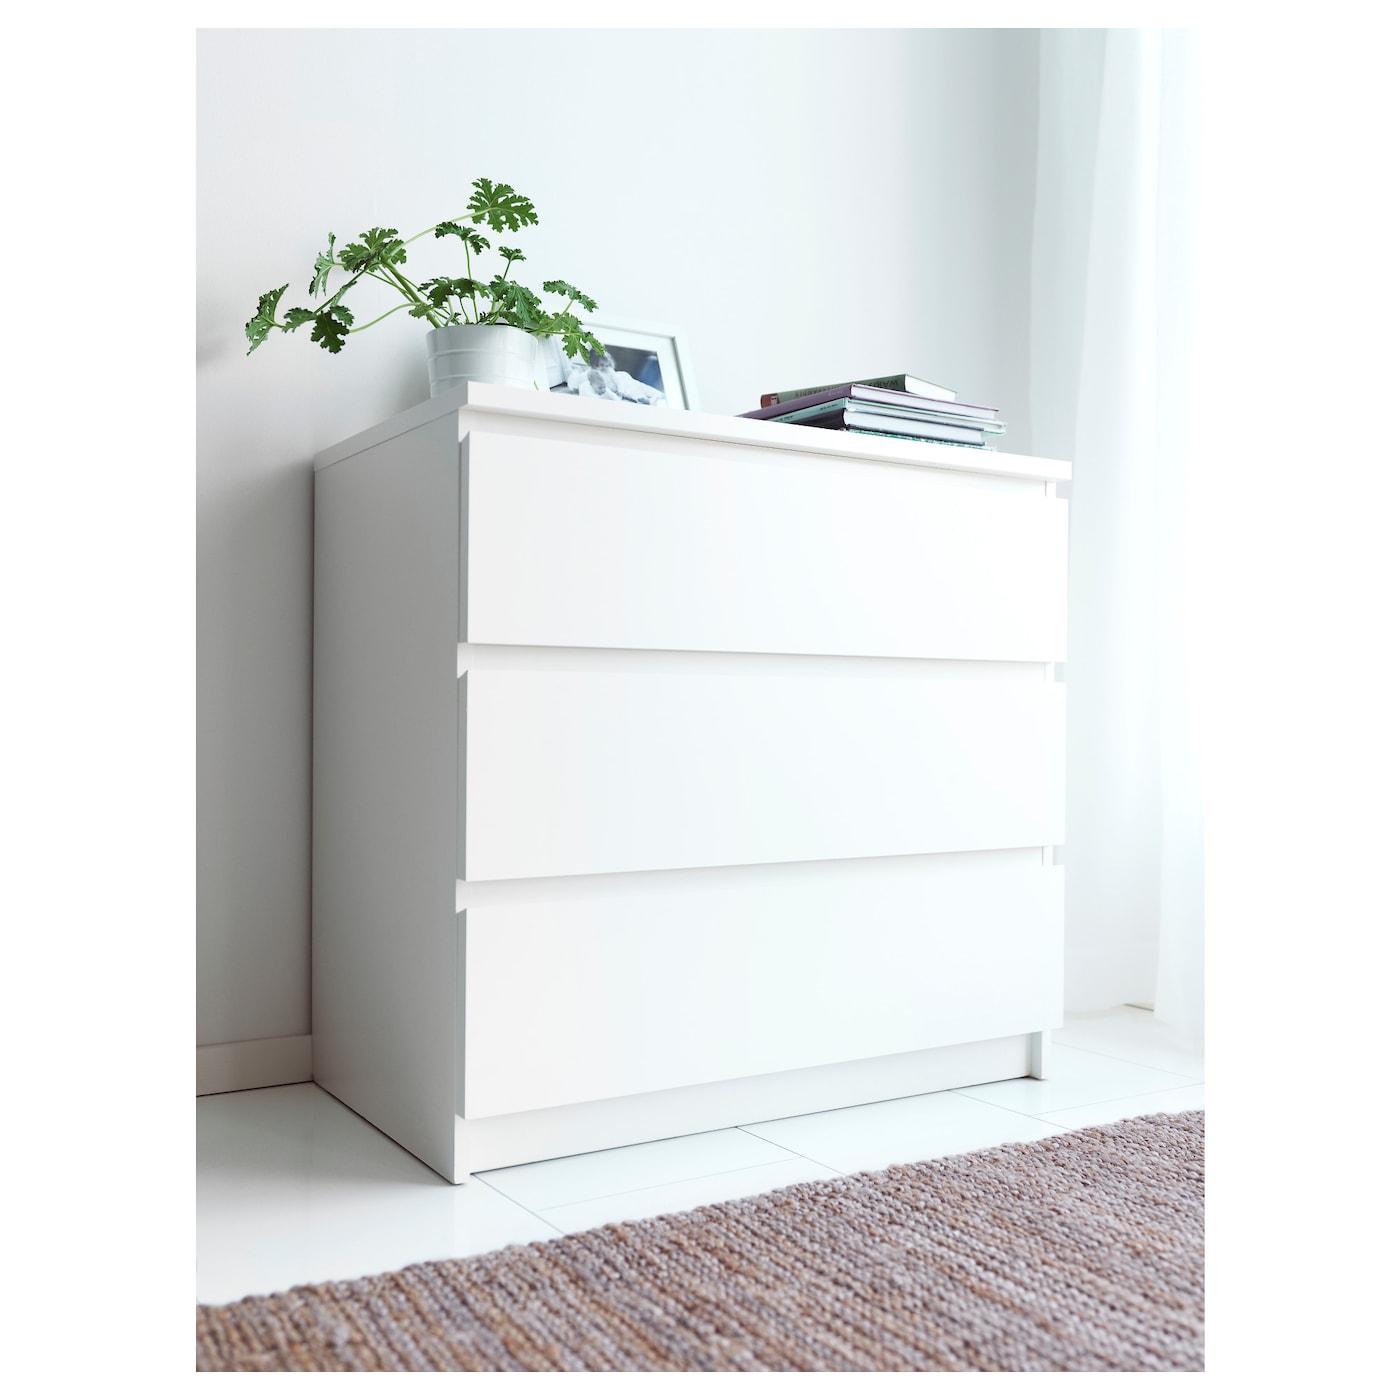 ikea aneboda three drawer dresser. Black Bedroom Furniture Sets. Home Design Ideas